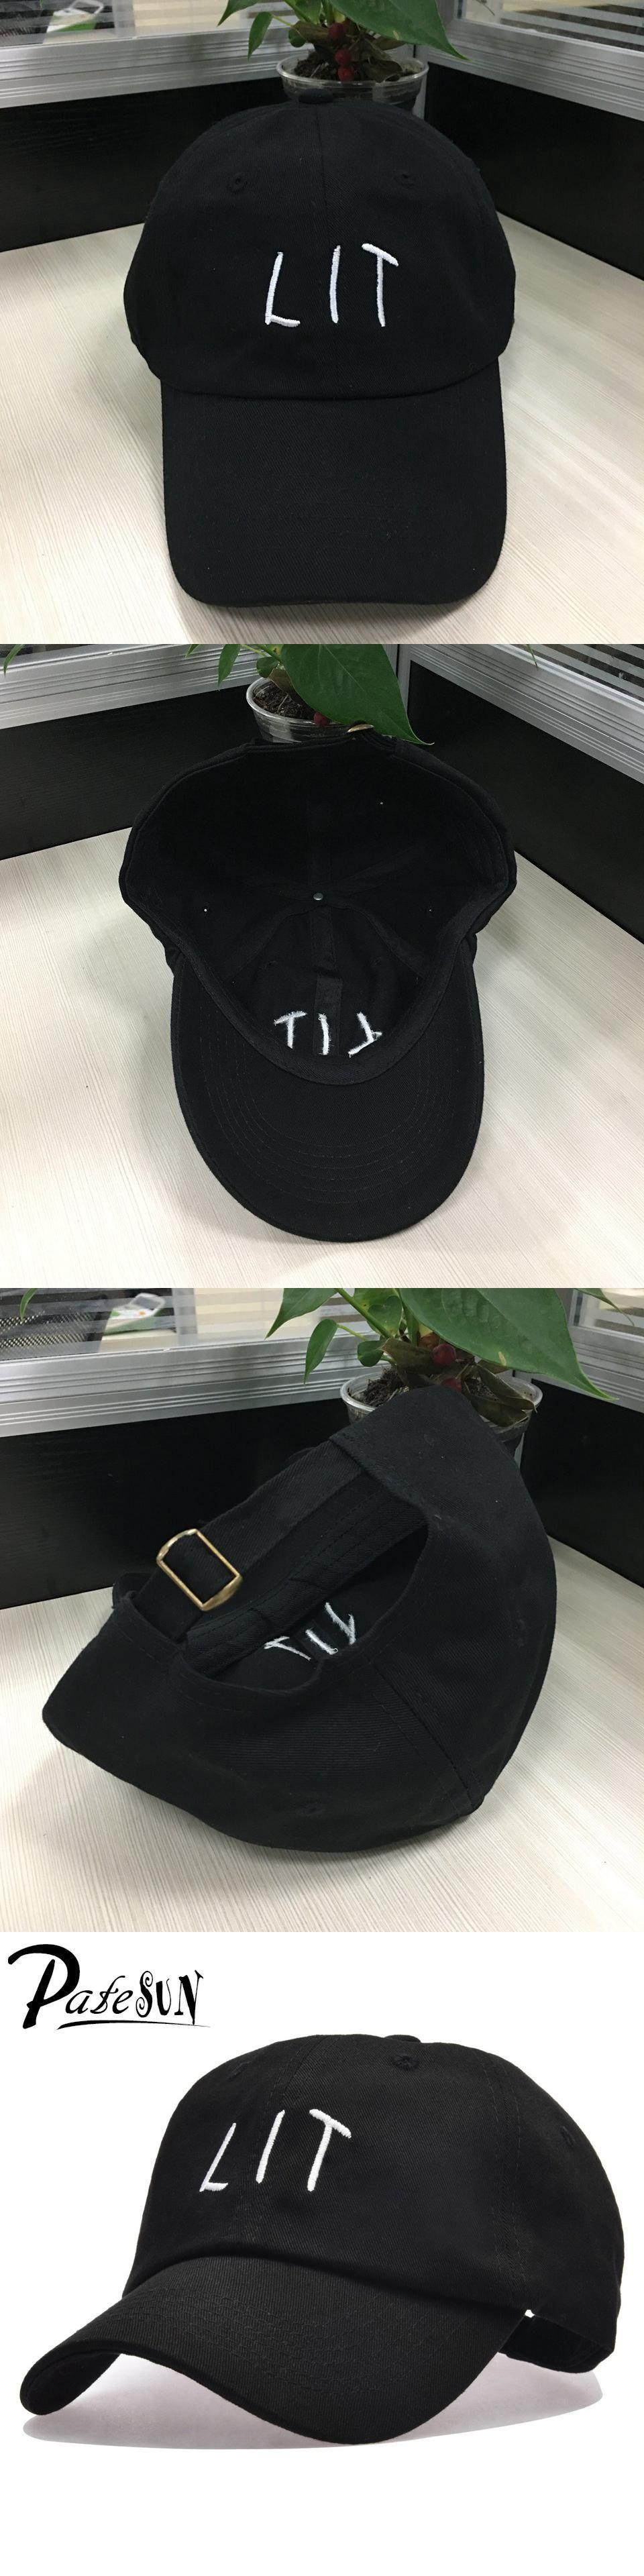 68011f286cf PATESUN 2017 Top Sale Snapback Hats women   men baseball cap Dad Hat